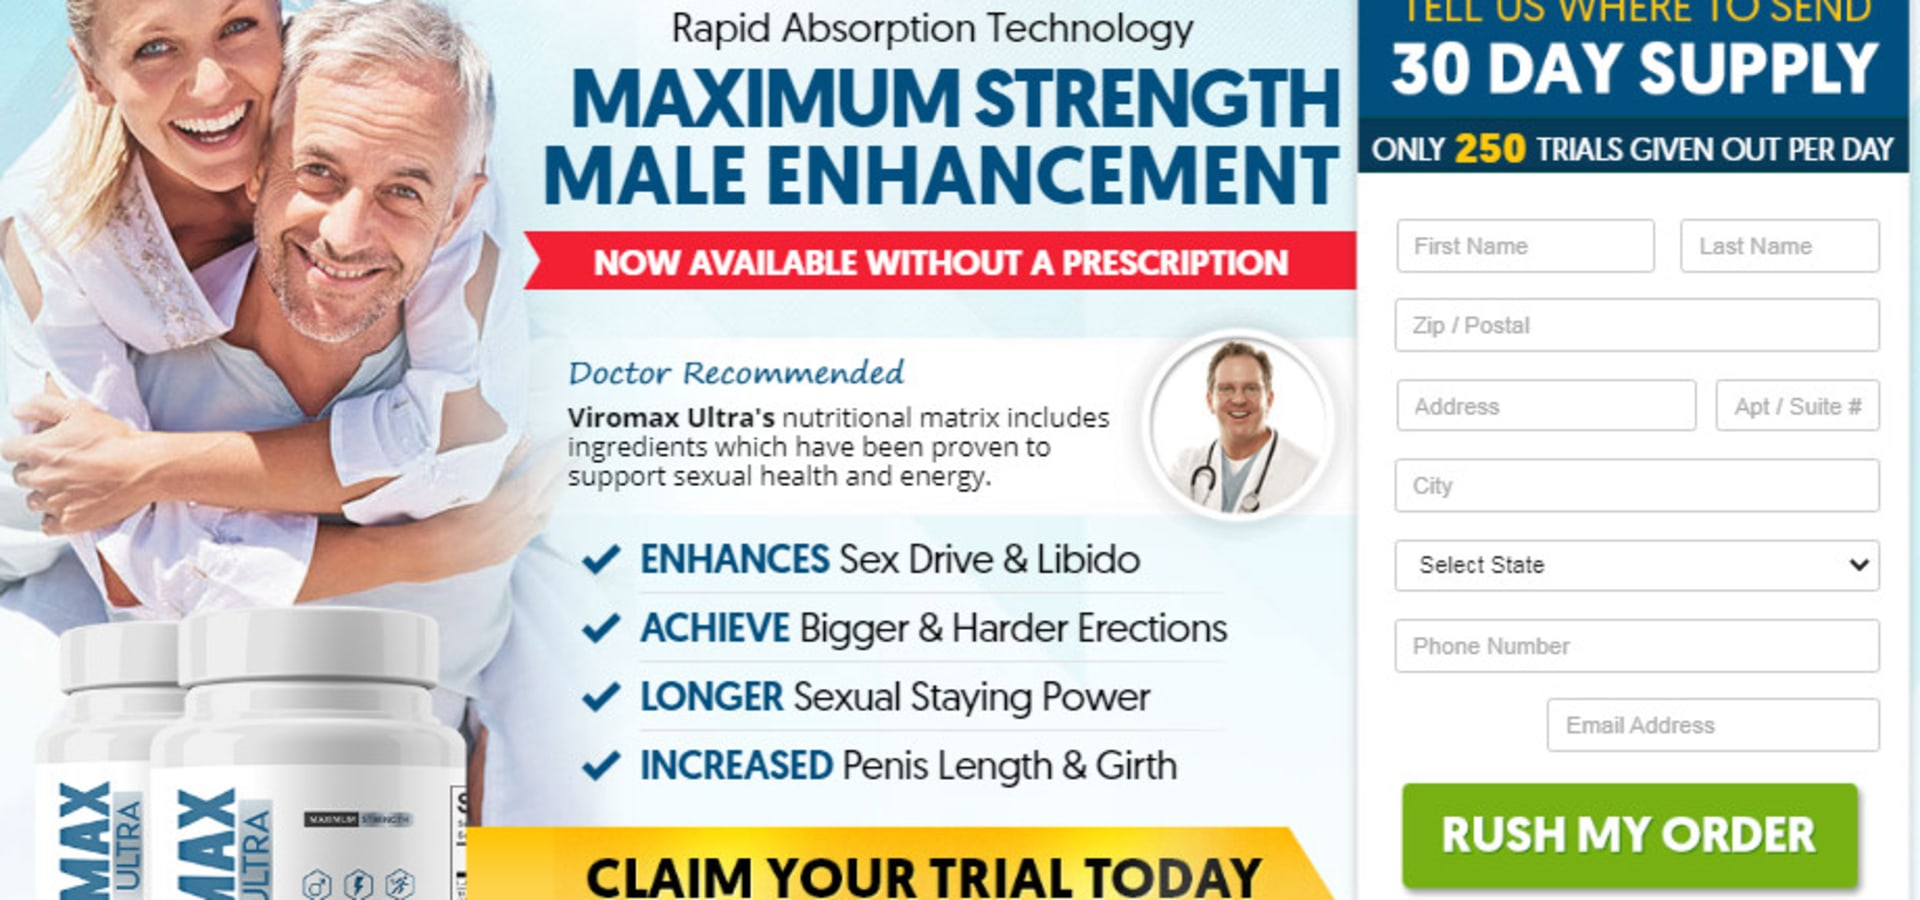 Viromax Ultra Reviews